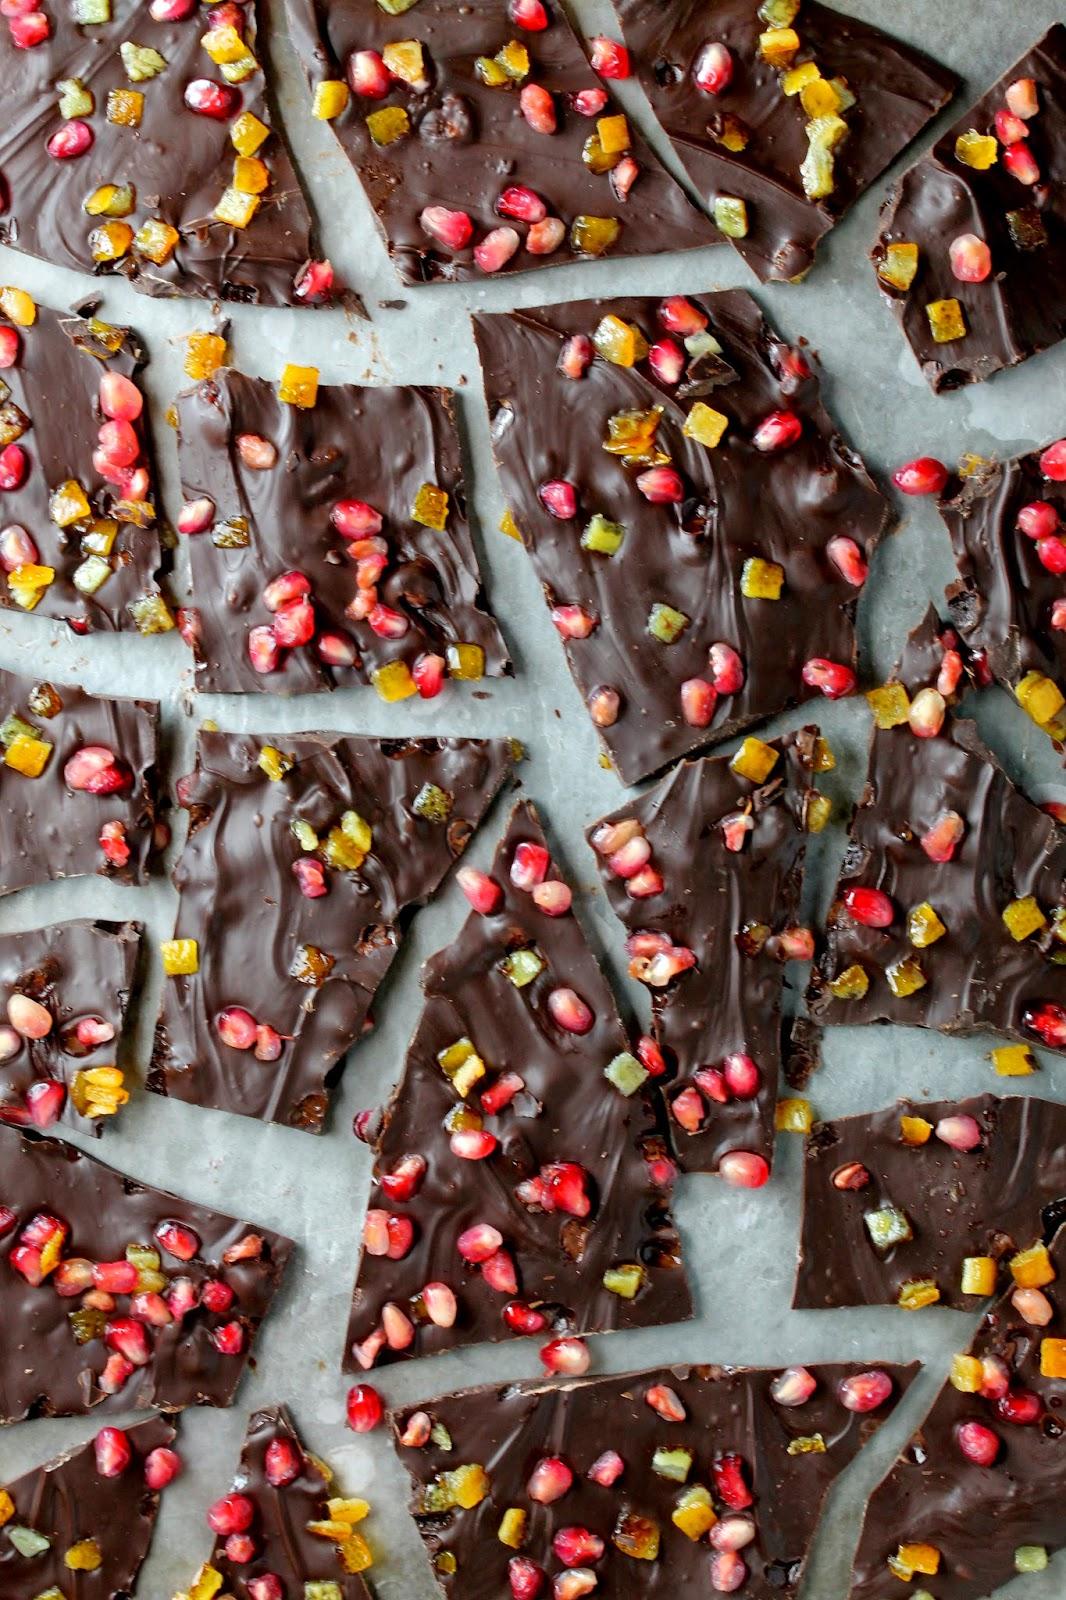 bark chocolate pomegranate ginger chocolate pomegranate ginger ...